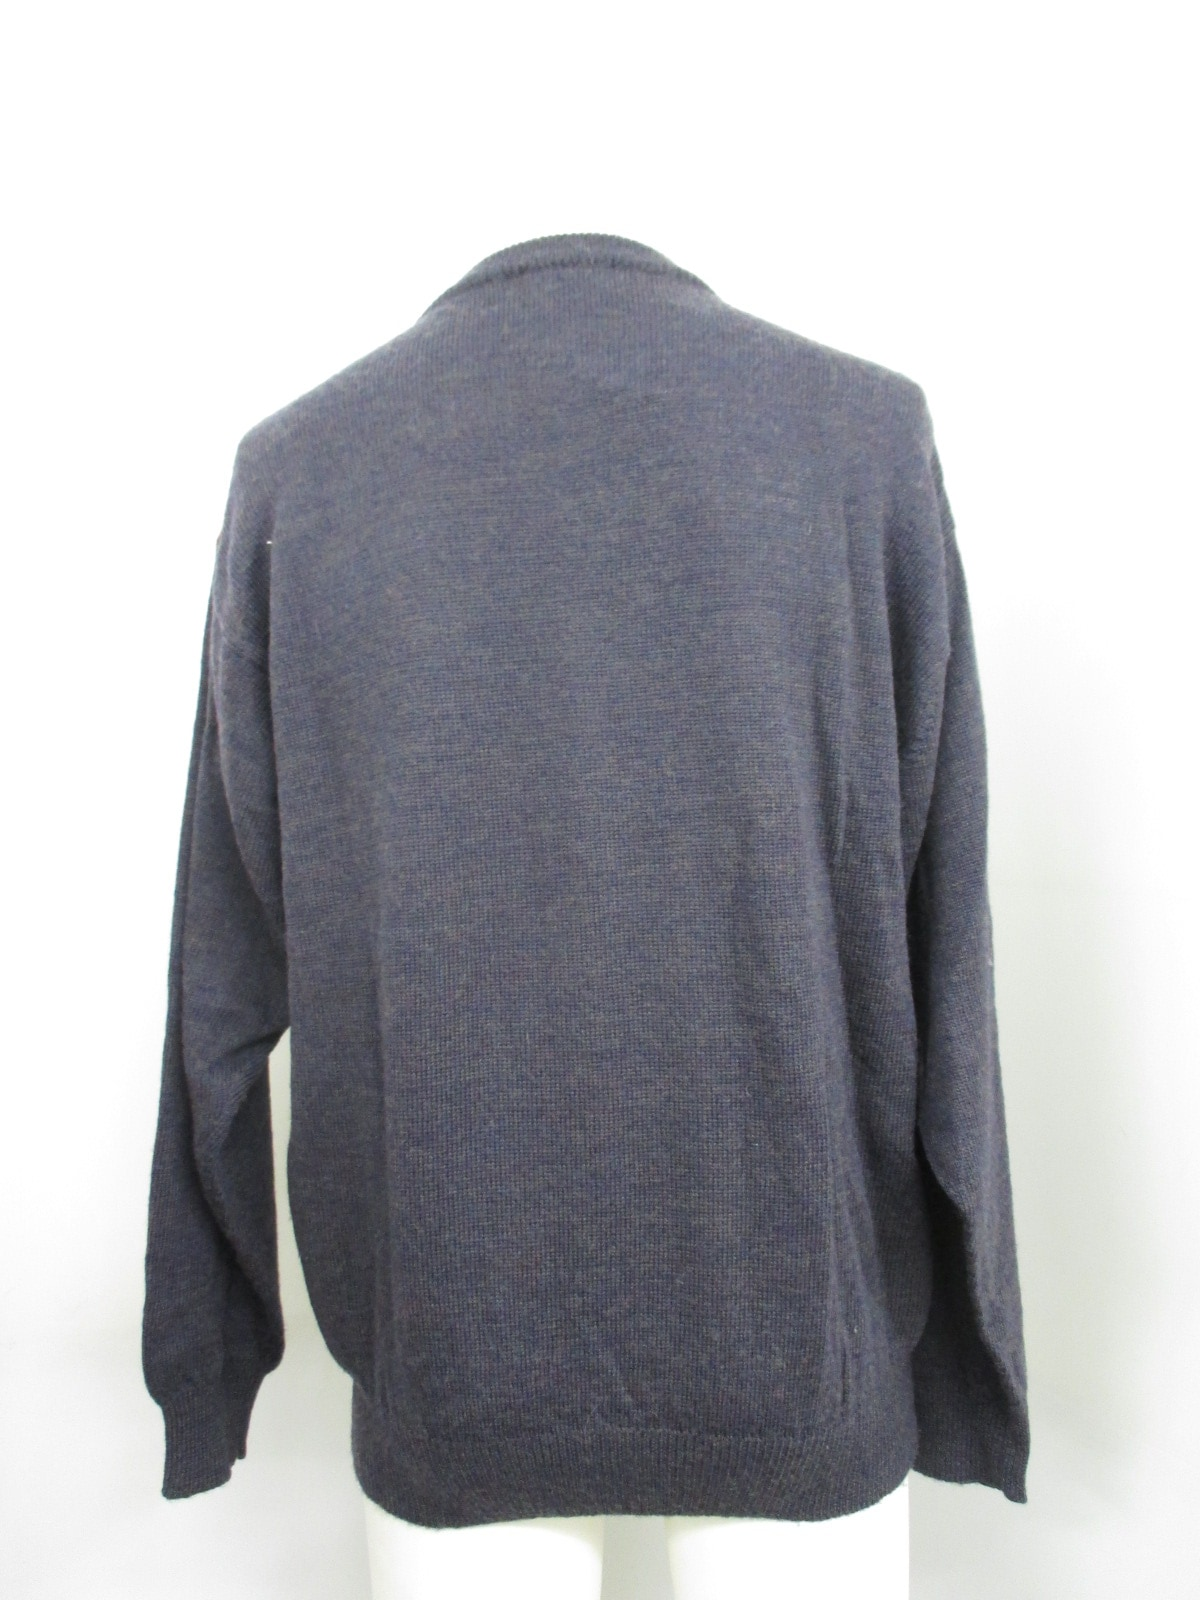 Geoffrey Beene(ジェフリー ビーン)のセーター